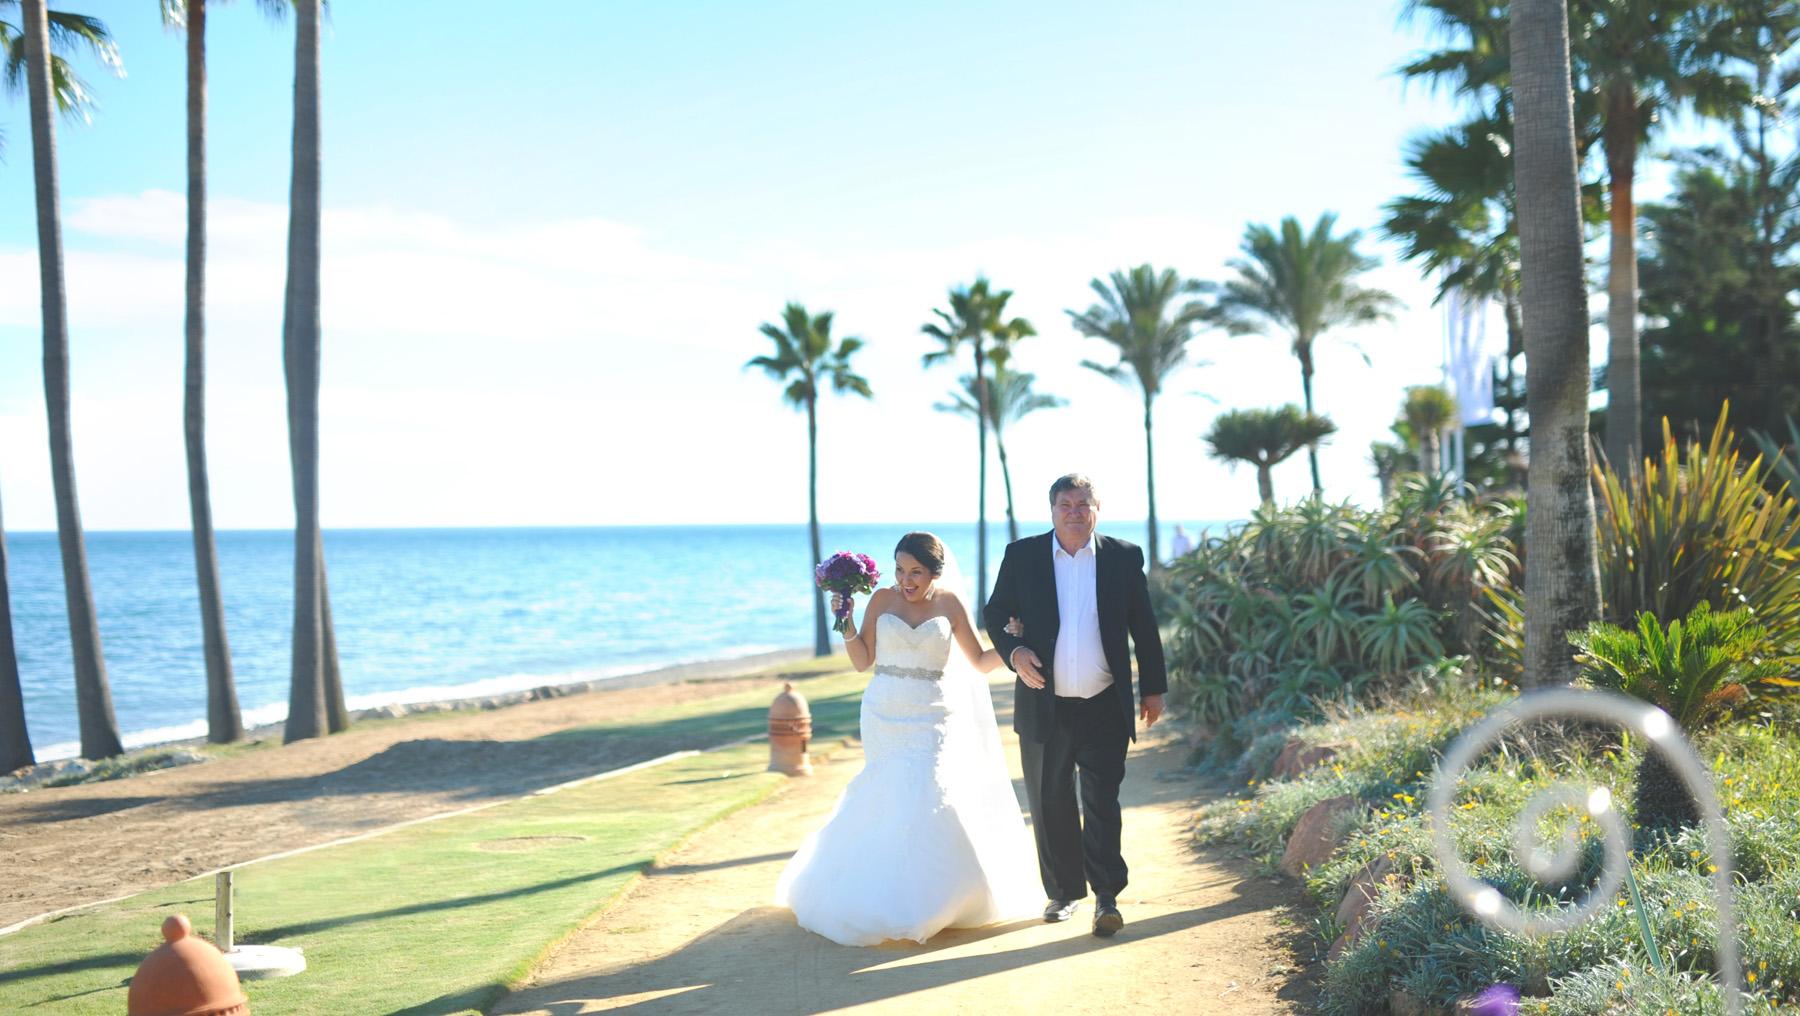 kempinski-weddings-estepona